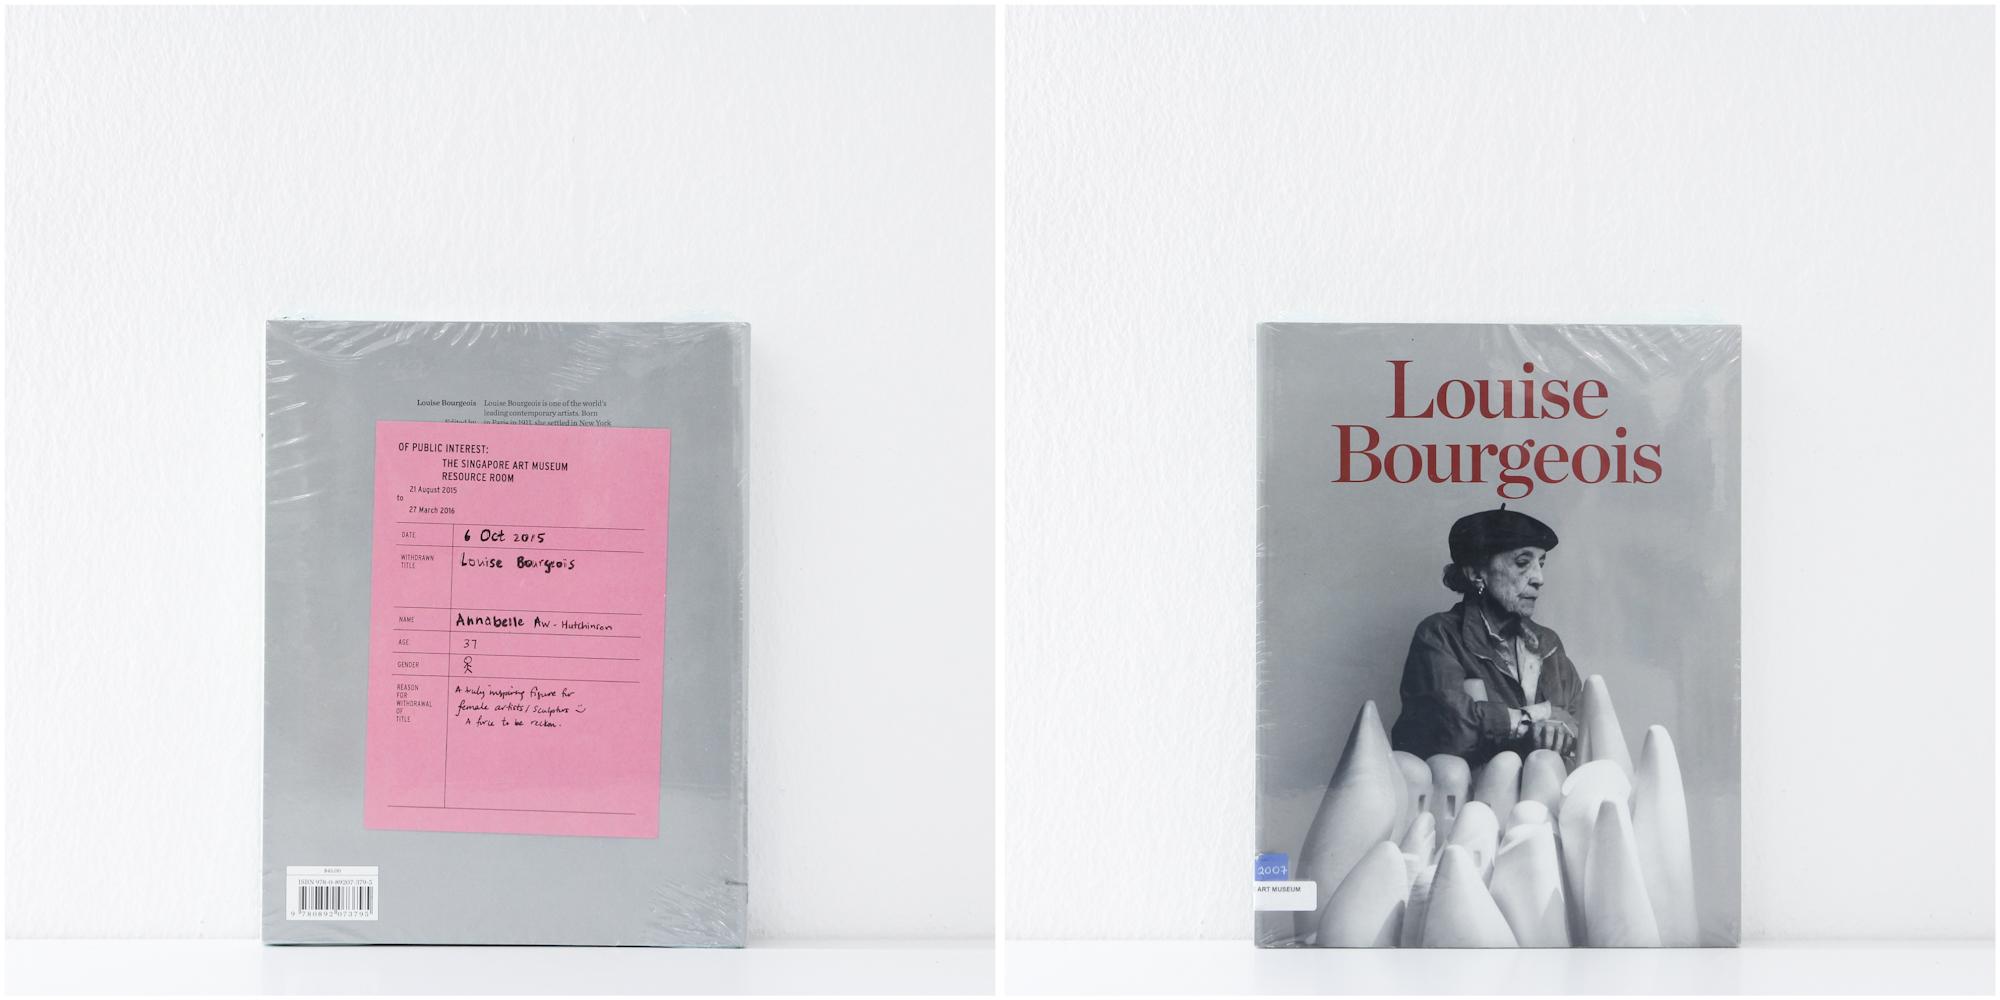 'Louise Bourgeois', 6/10/15, Annabelle Aw-Hutchinson, 37, Female